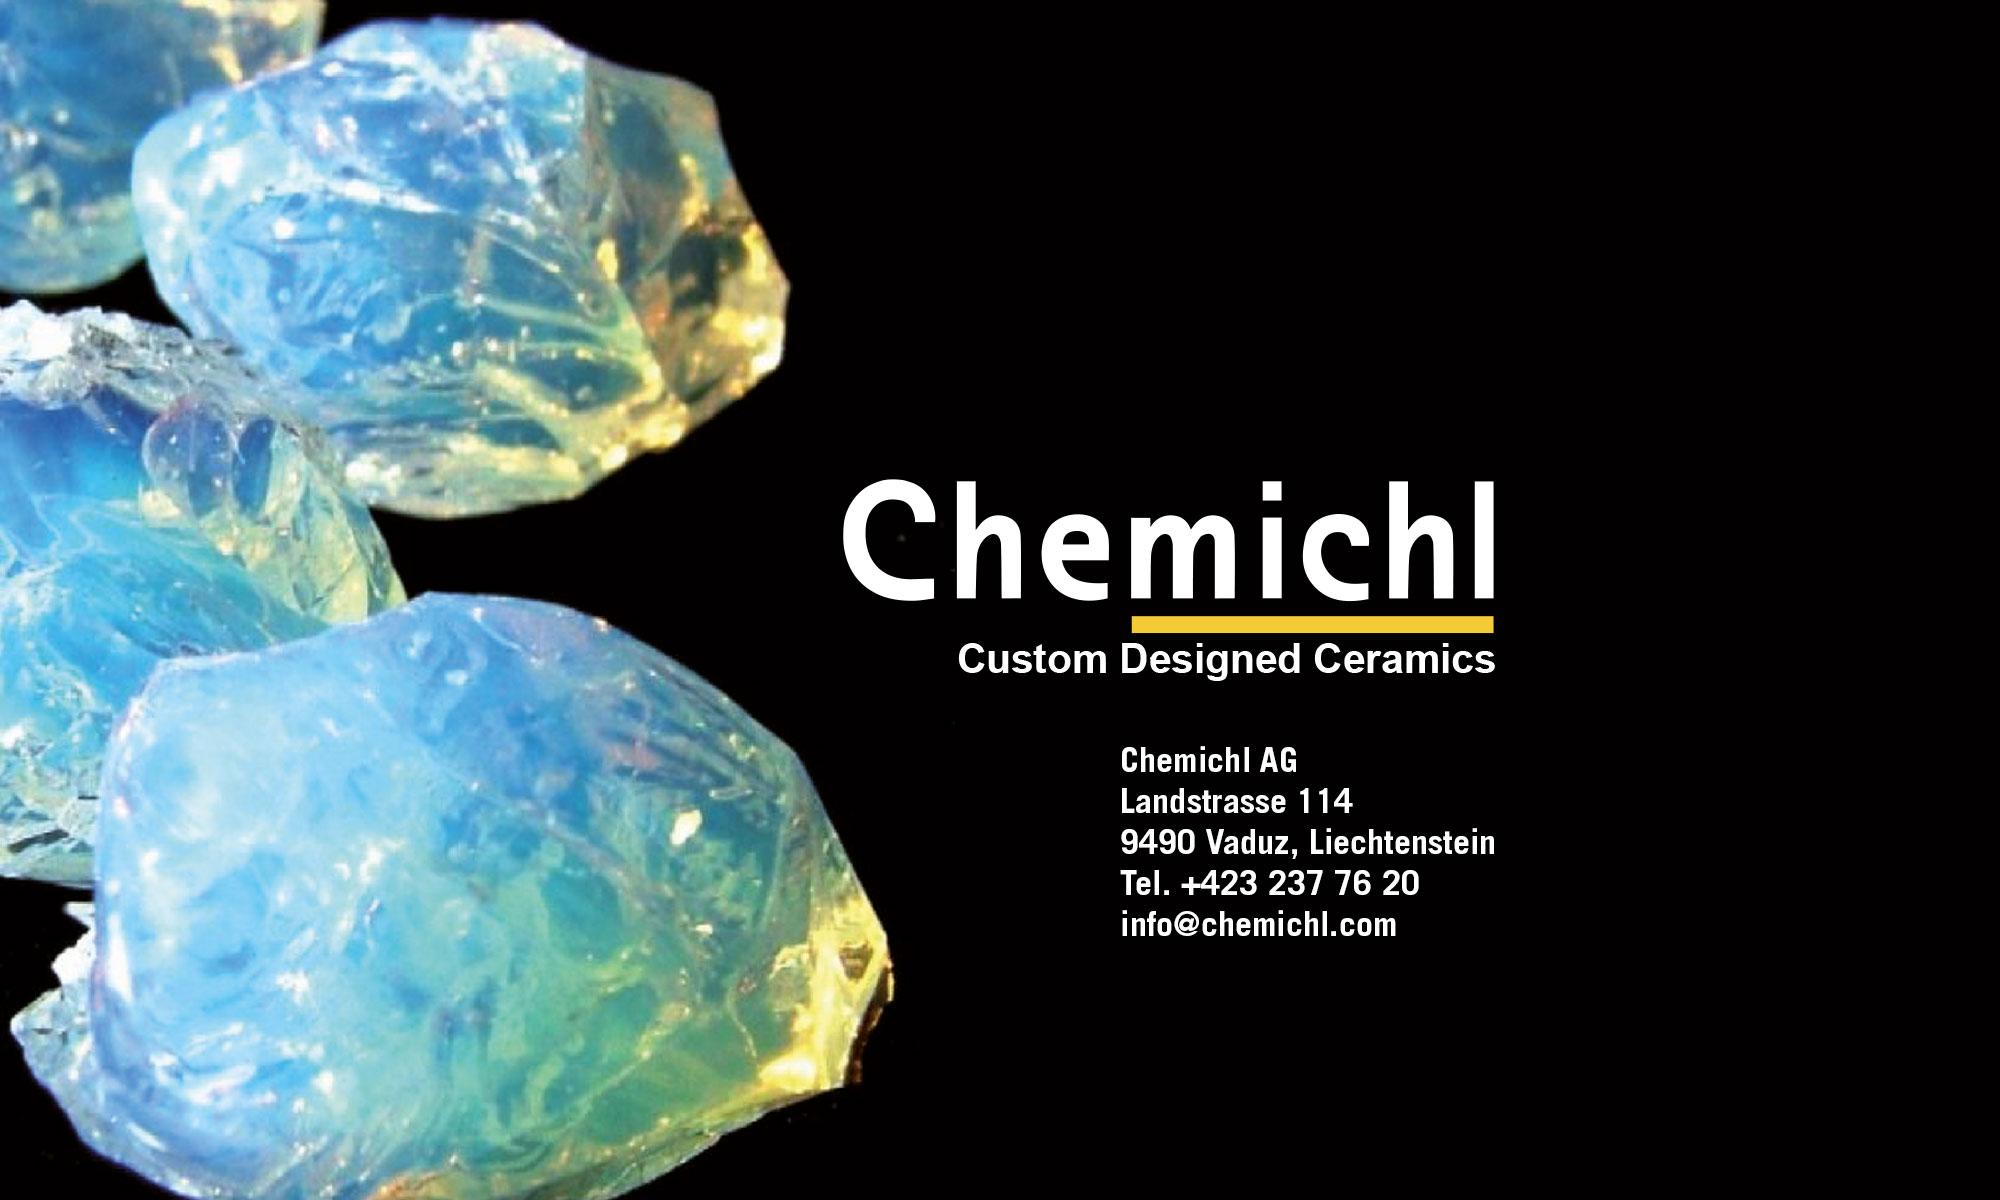 Chemichl AG